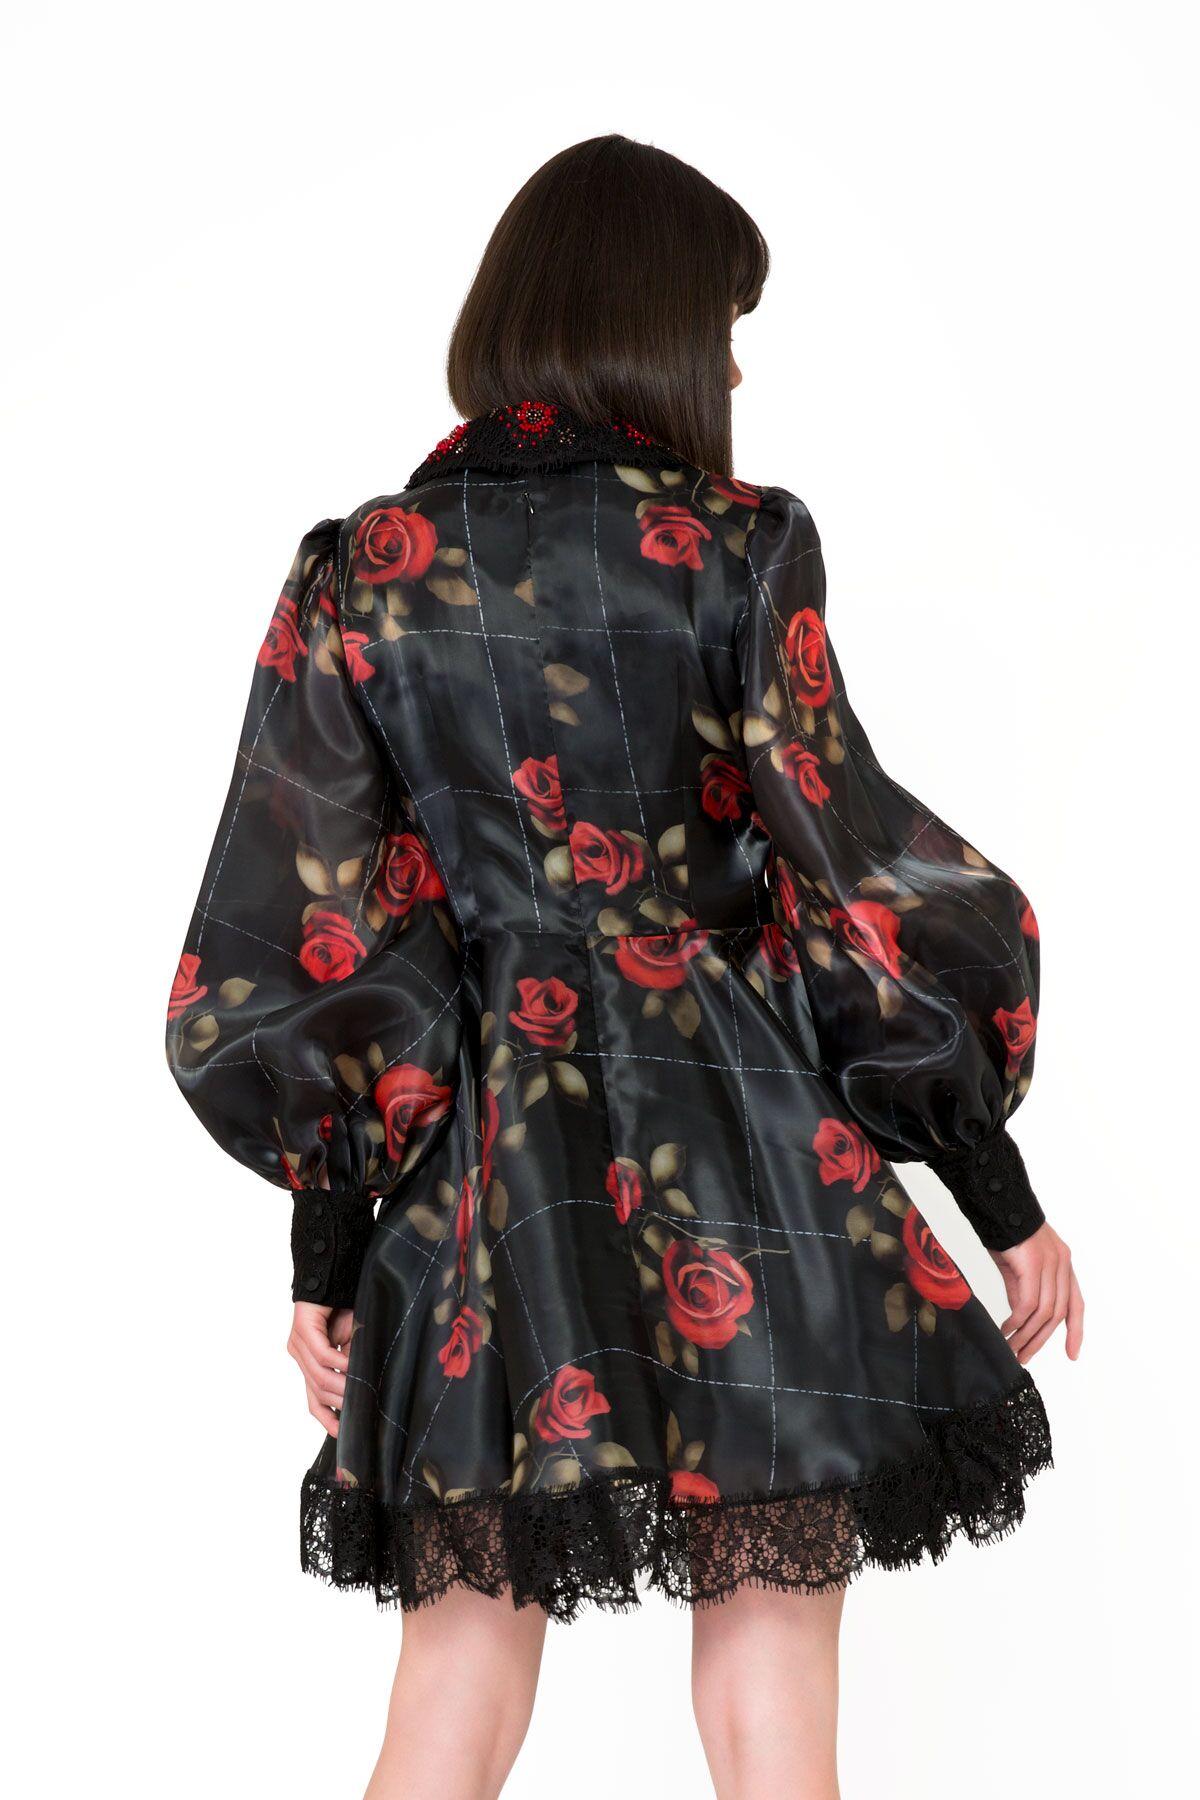 Floral Pattern Lace Detailed Black Mini Dress